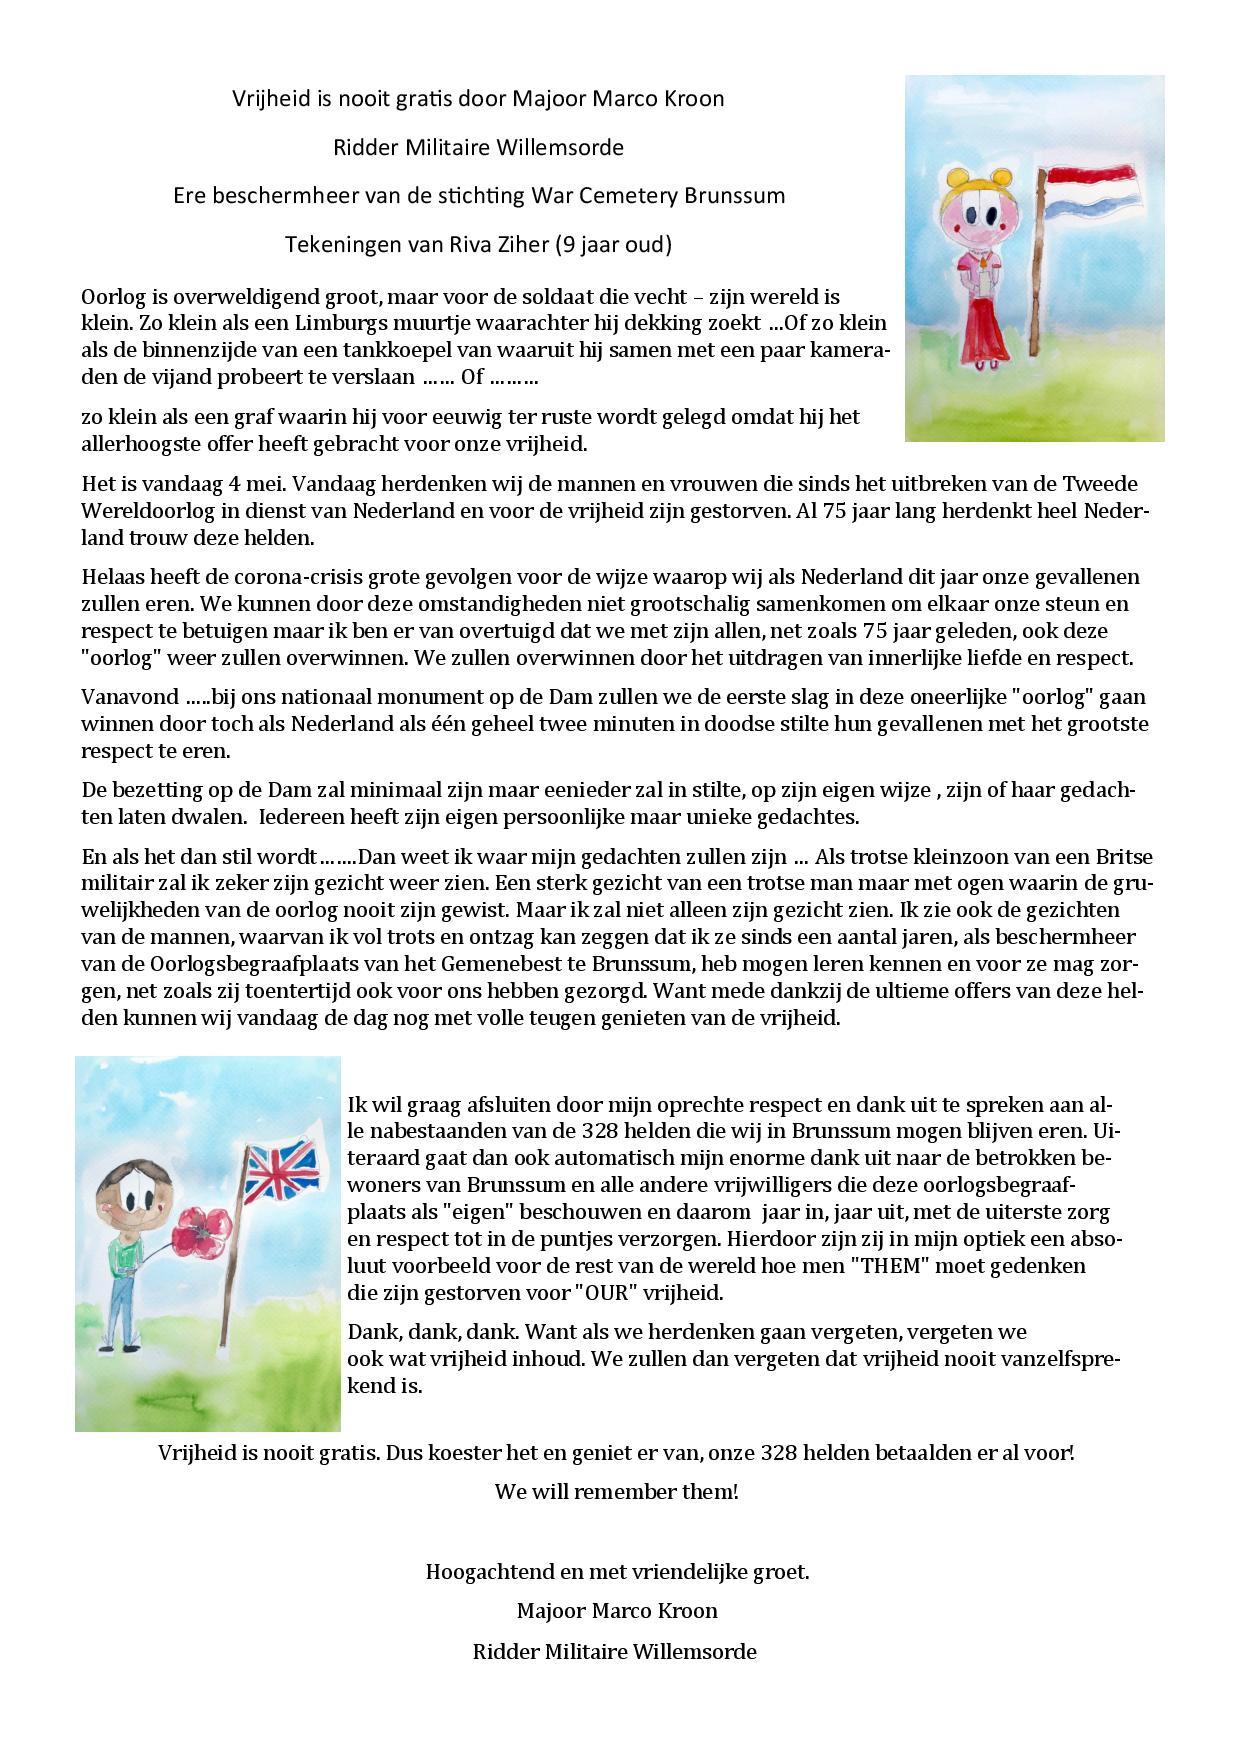 2020-05-04 | Bericht Marco Kroon Dodenherdenking